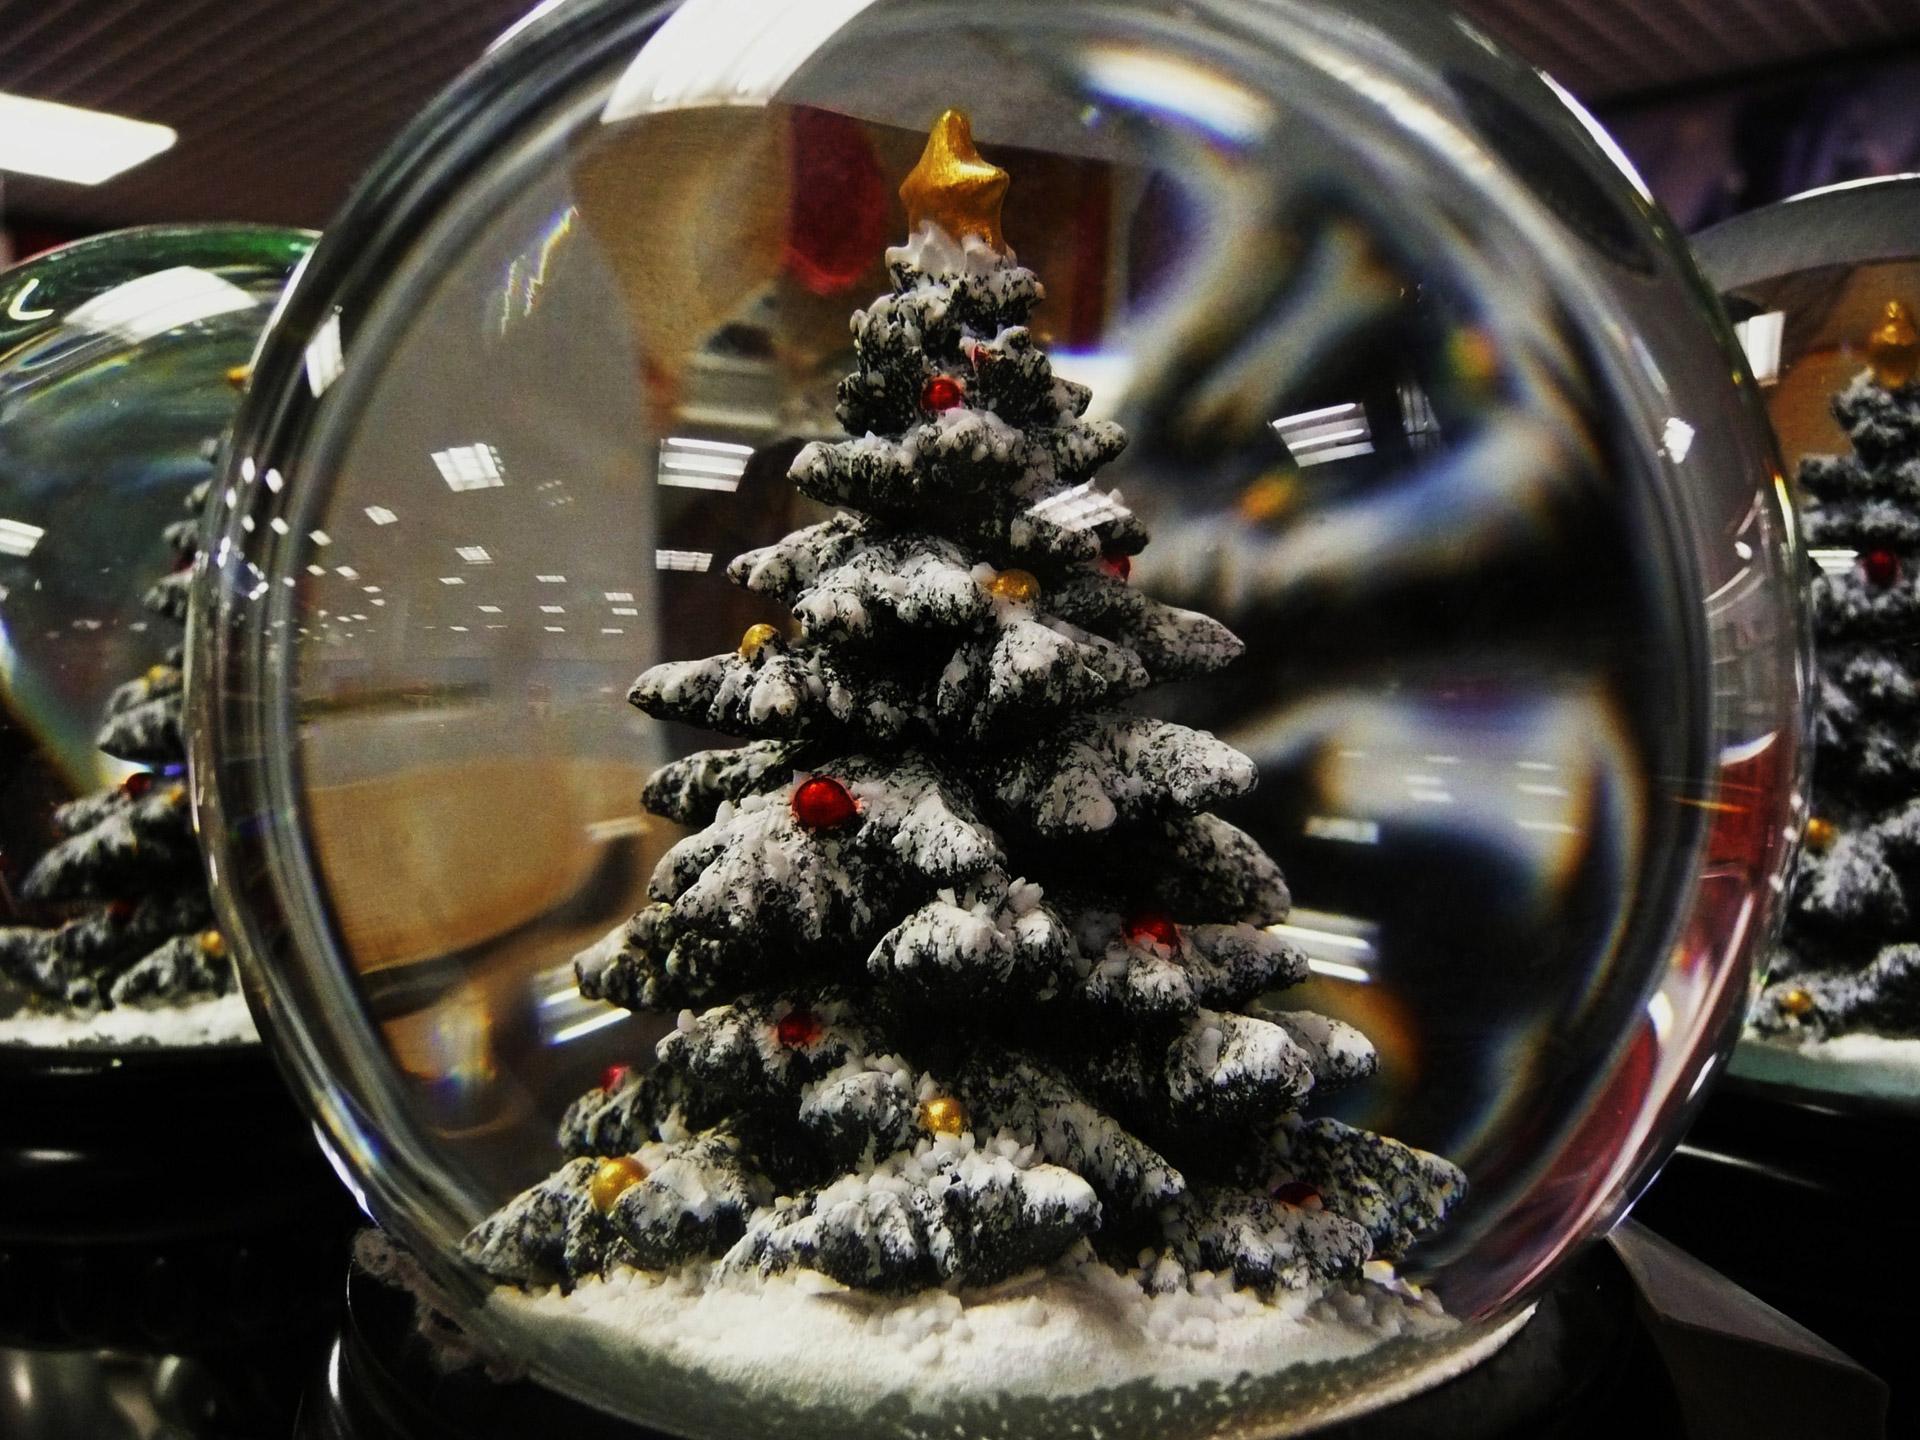 Christmas Decorations Free Stock Photo